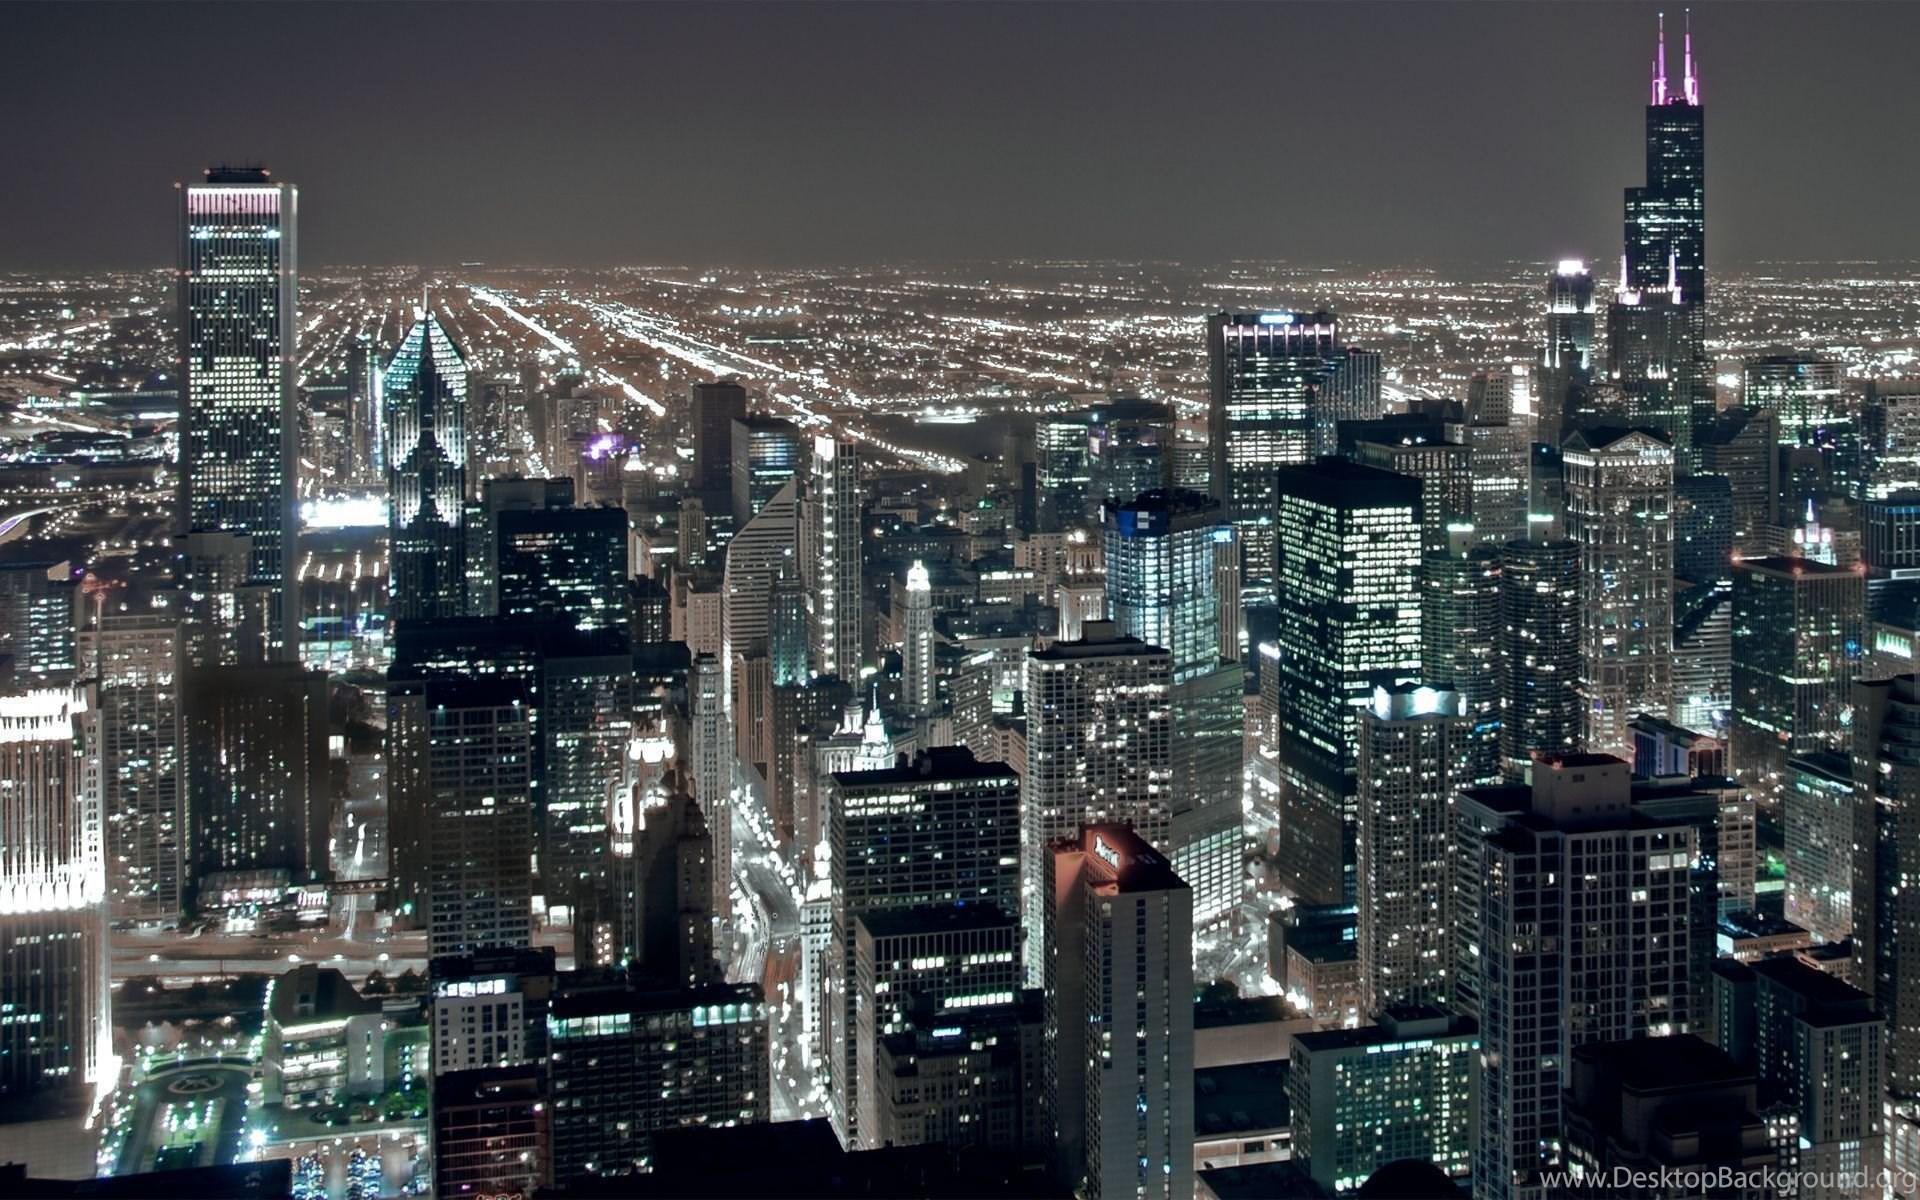 Chicago City Night Lights Hd Wallpapers Jpg Desktop Background